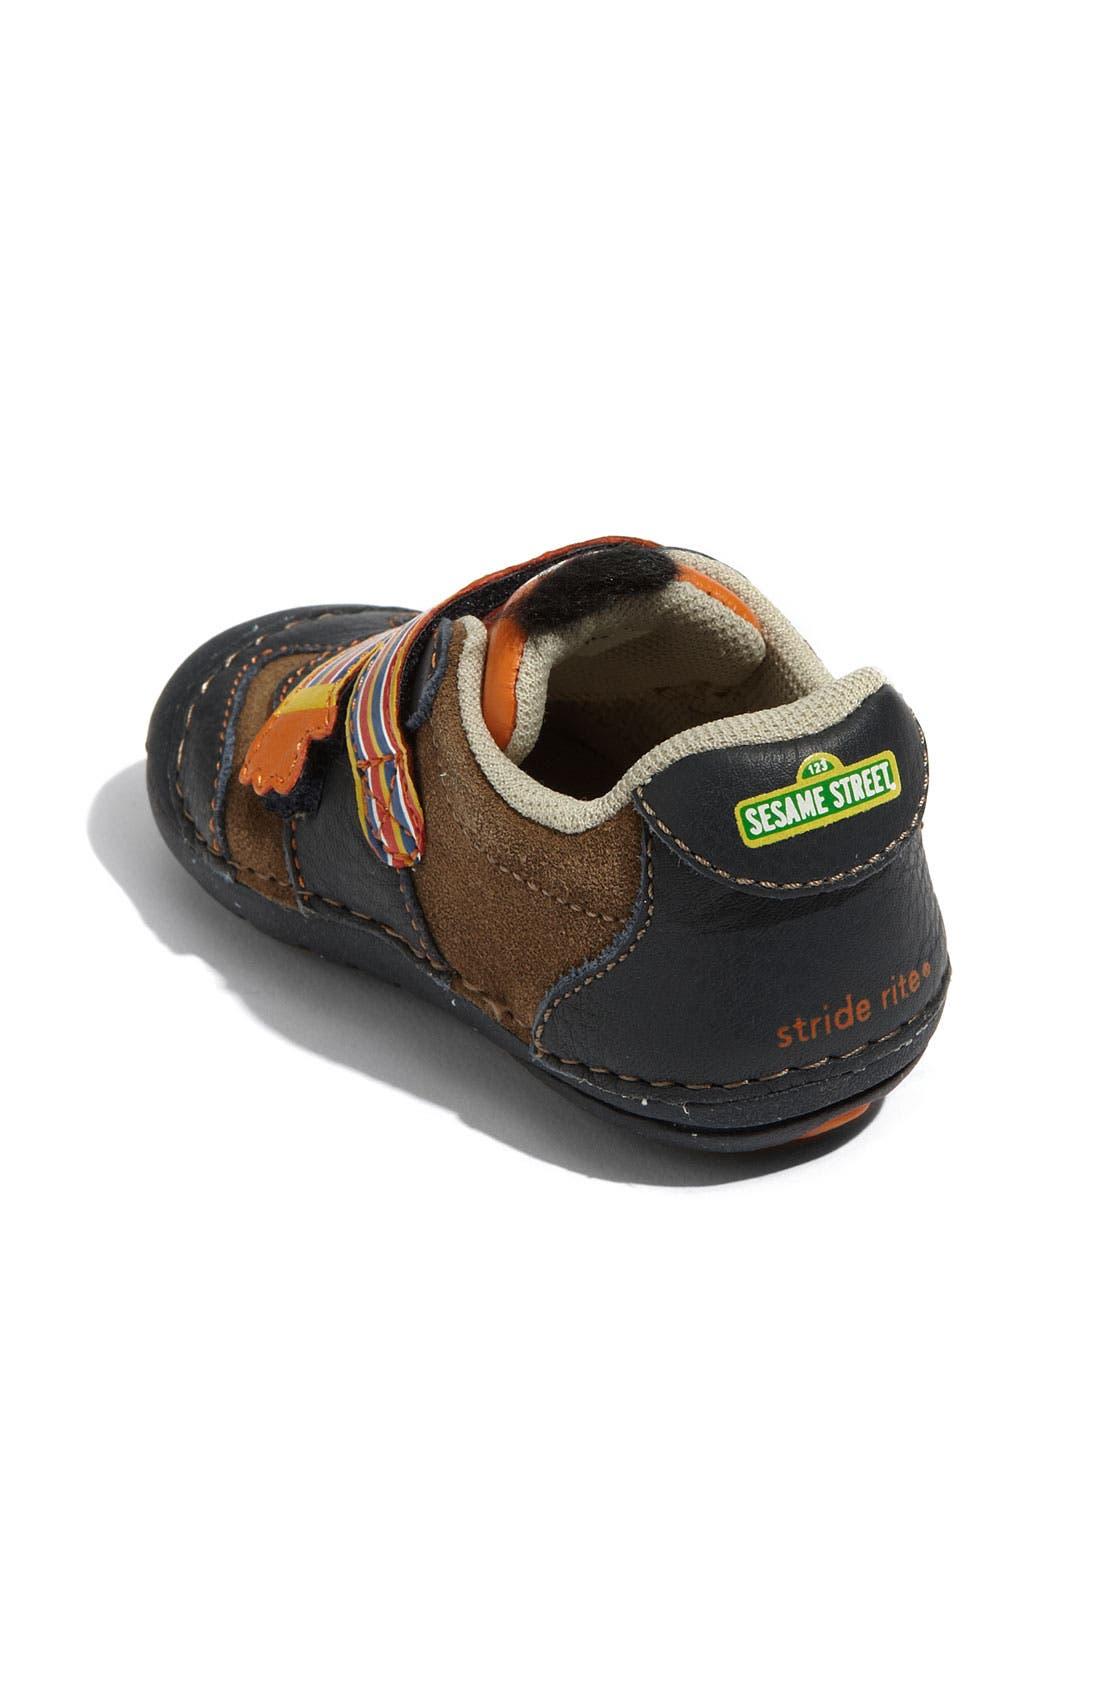 Alternate Image 2  - Stride Rite 'Sesame Street® - Ernie' Sneaker (Baby & Walker)